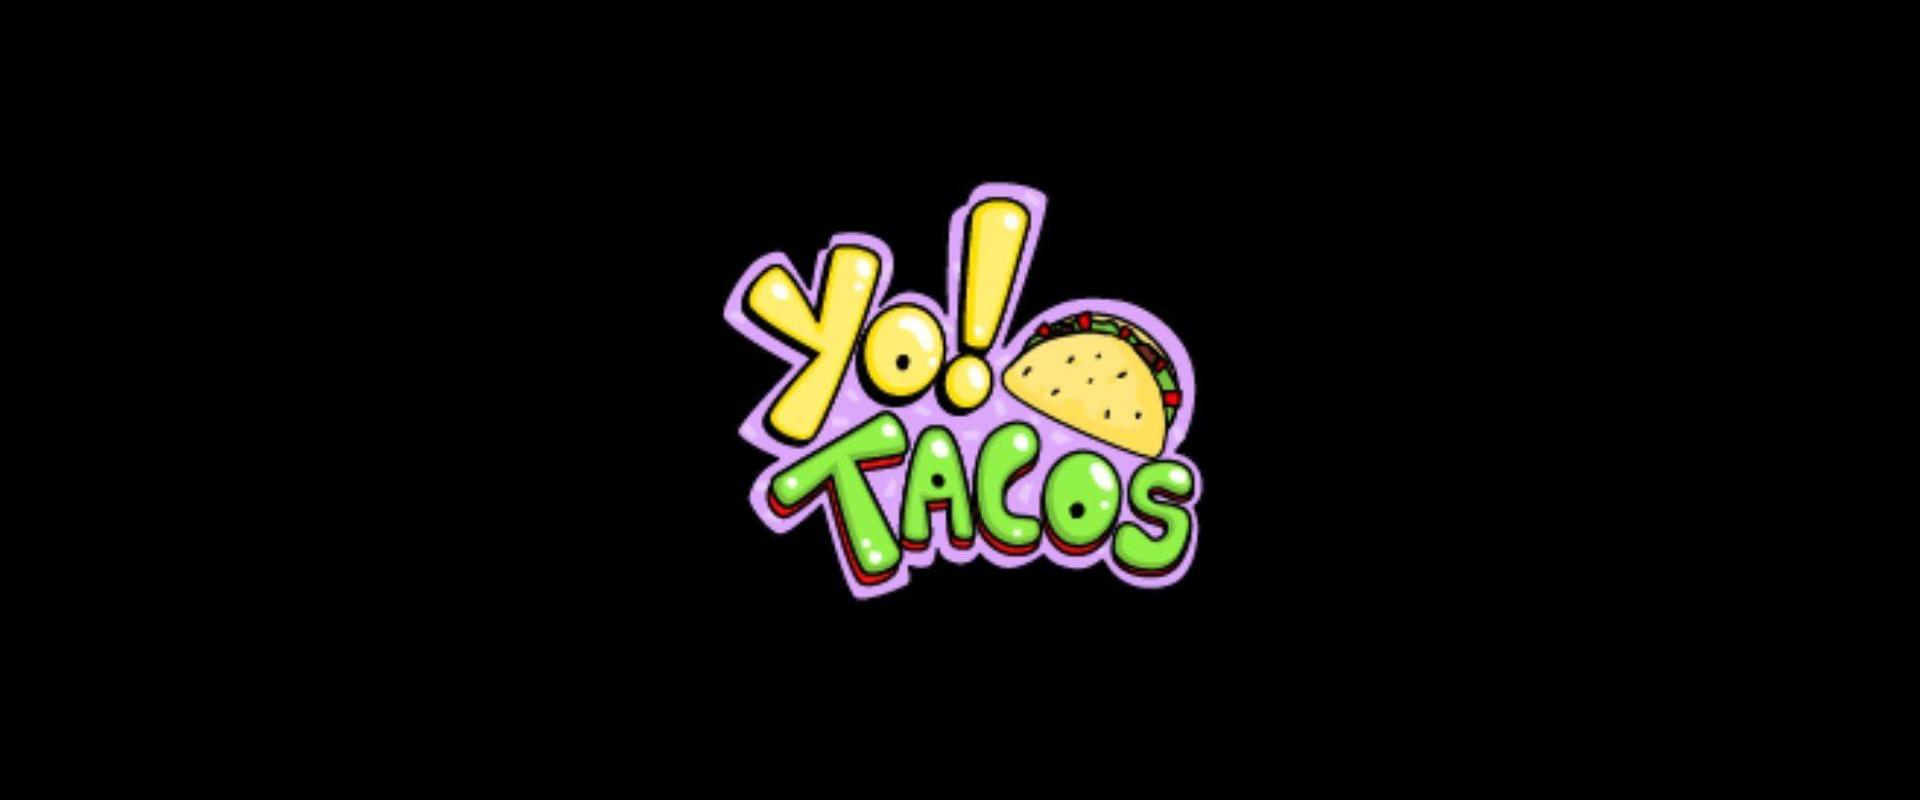 Yo Tacos